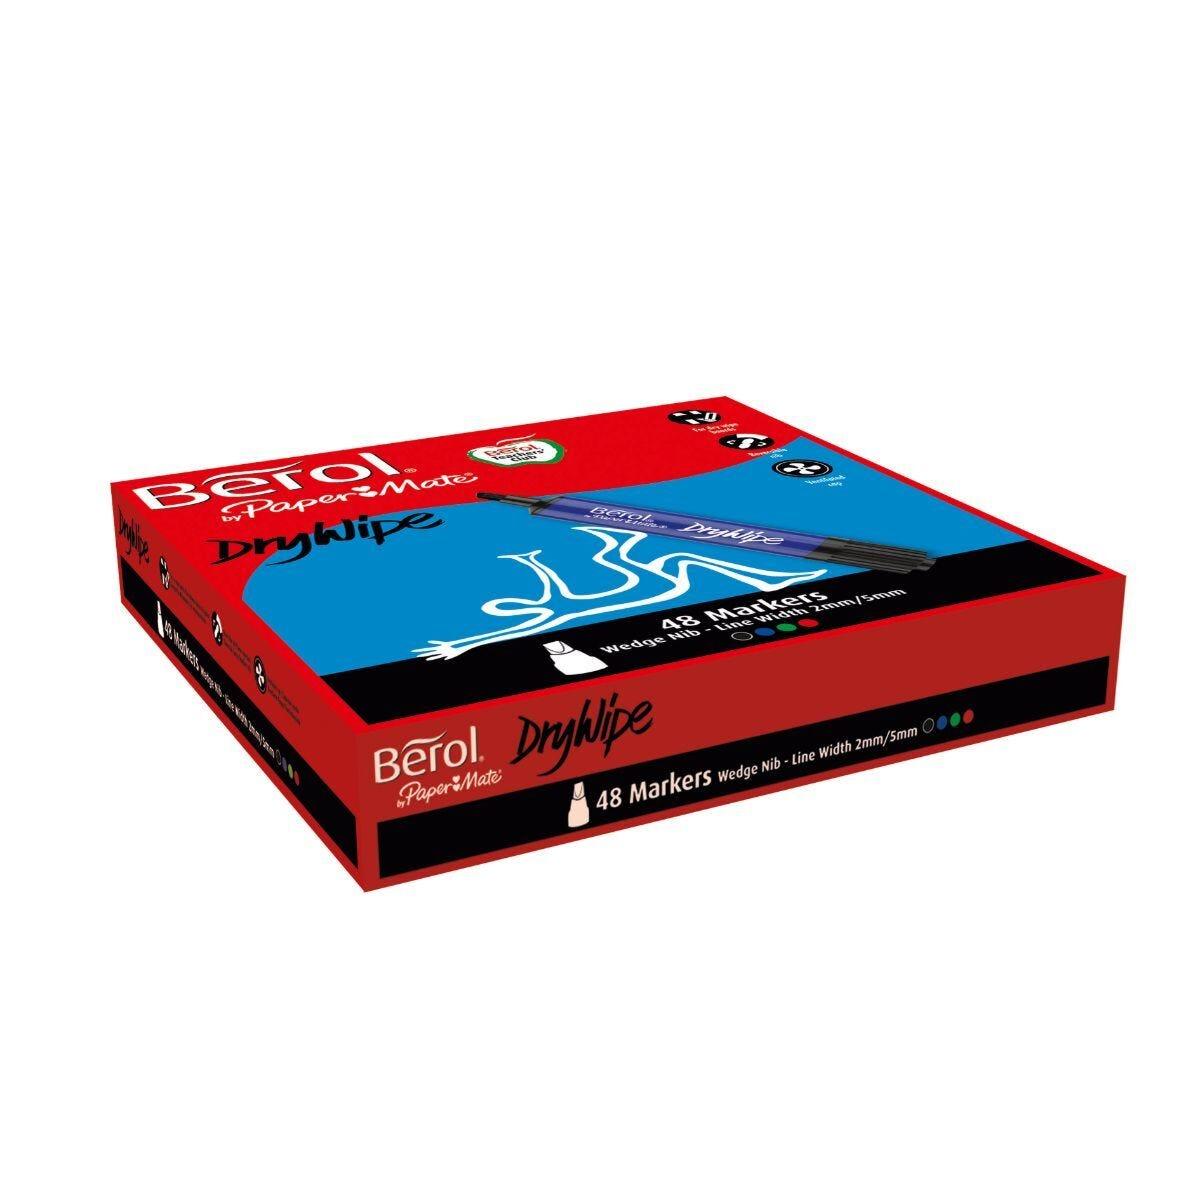 Berol Dry Wipe Chisel Tip Whiteboard Marker Pen Blue Pack of 96